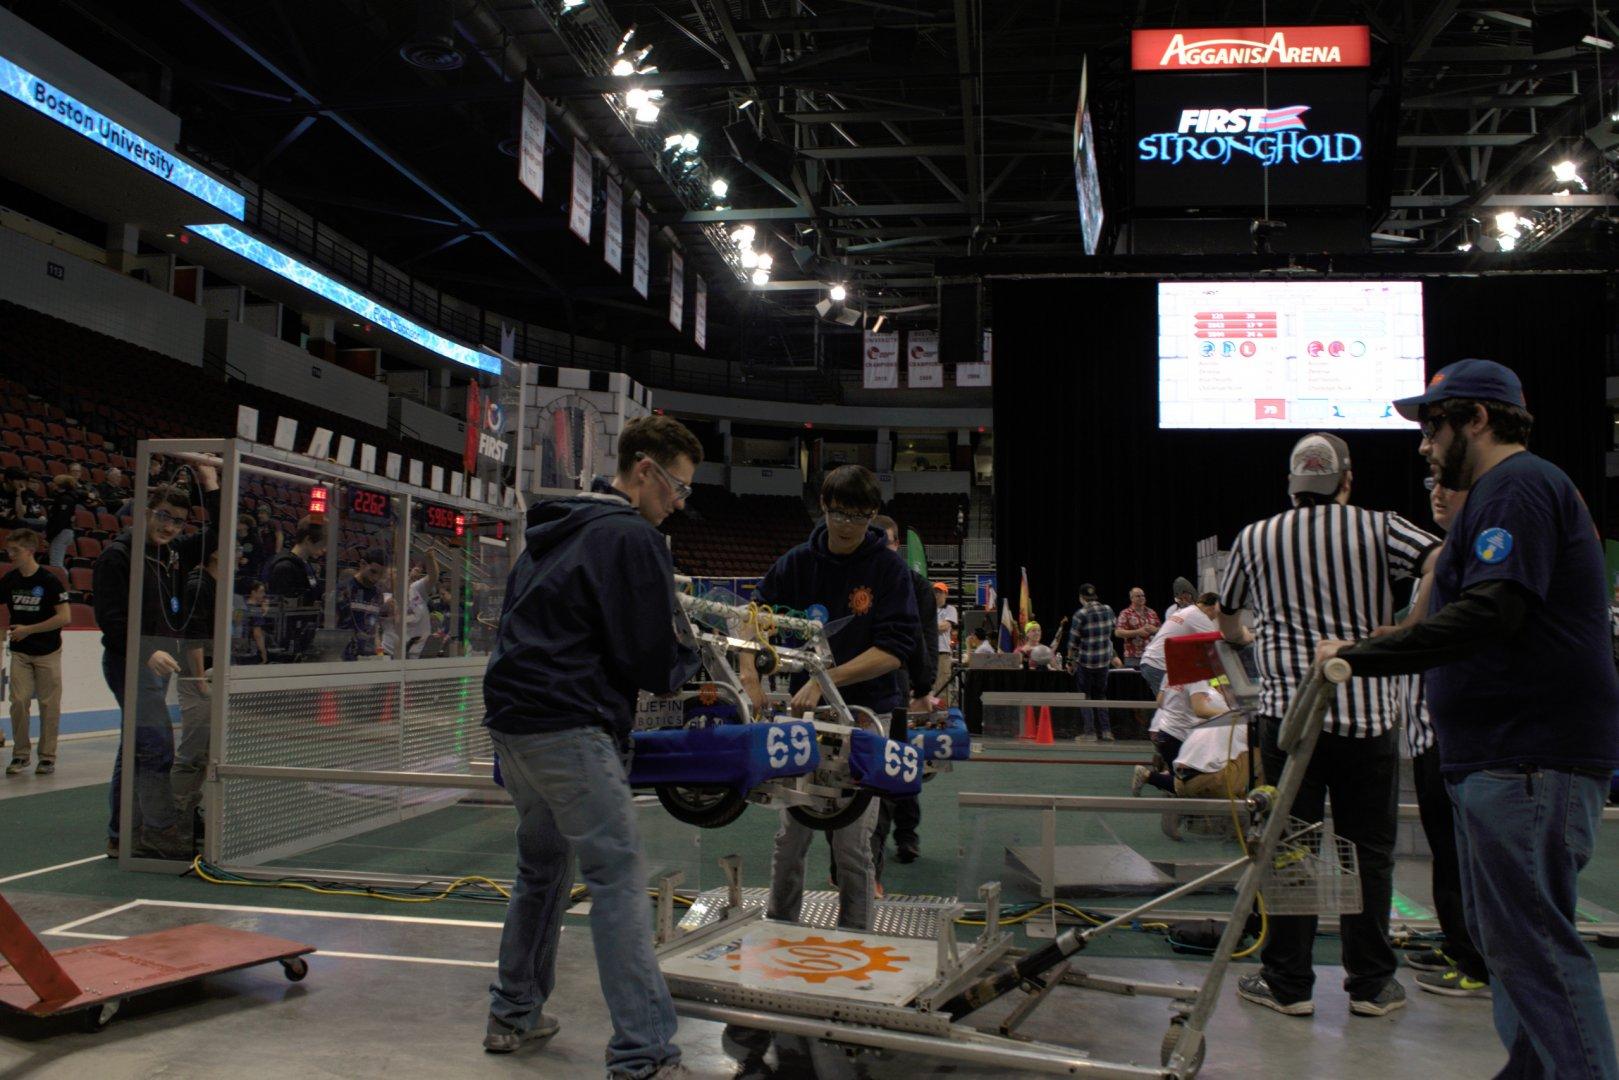 141.Boston FIRST Robotics Competition 04-03-2016.jpg